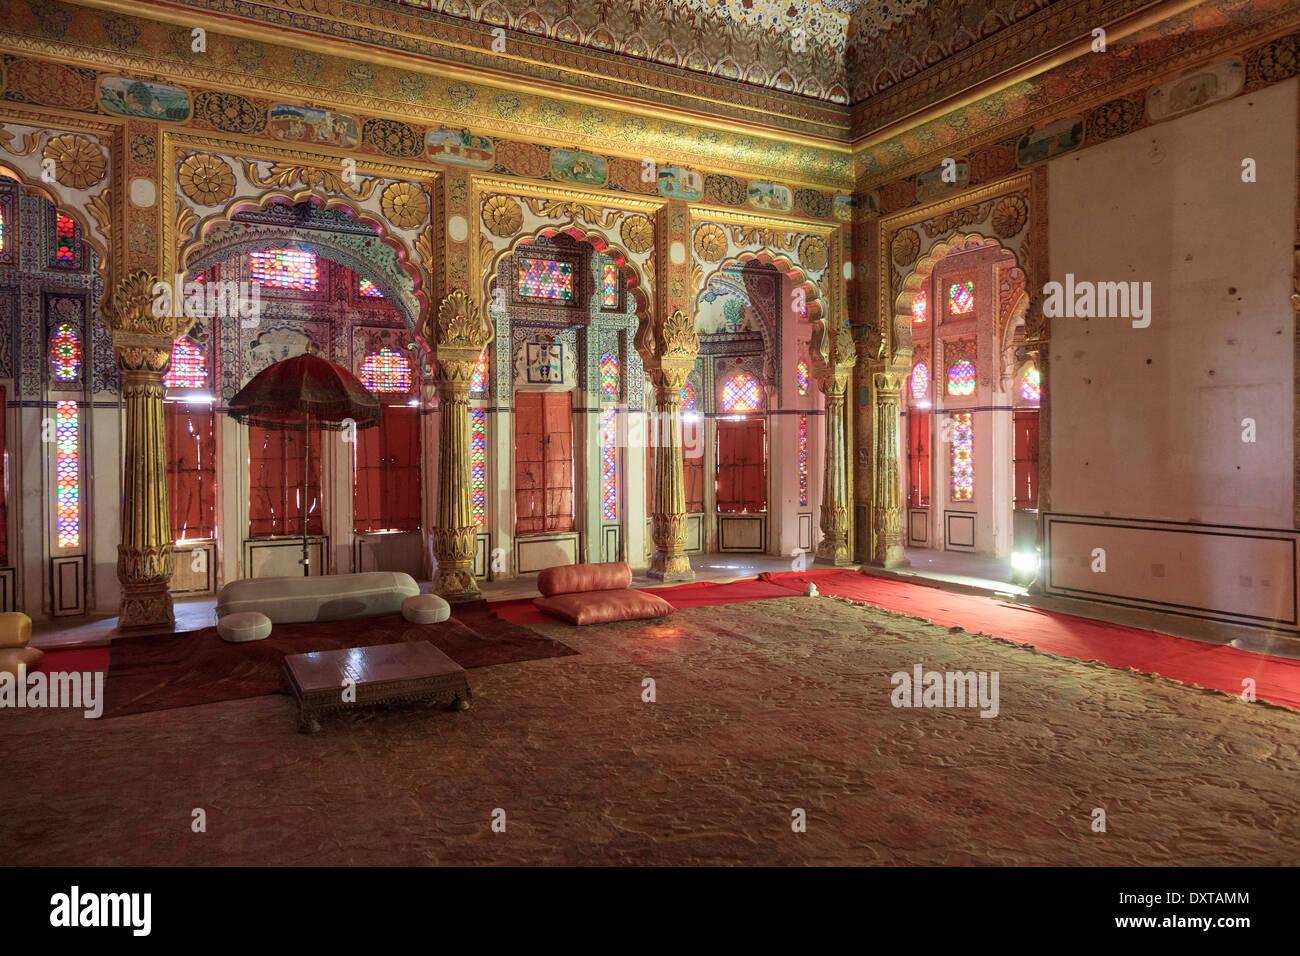 India, Rajasthan, Jodhpur, Mehrangarh Fort - Stock Image